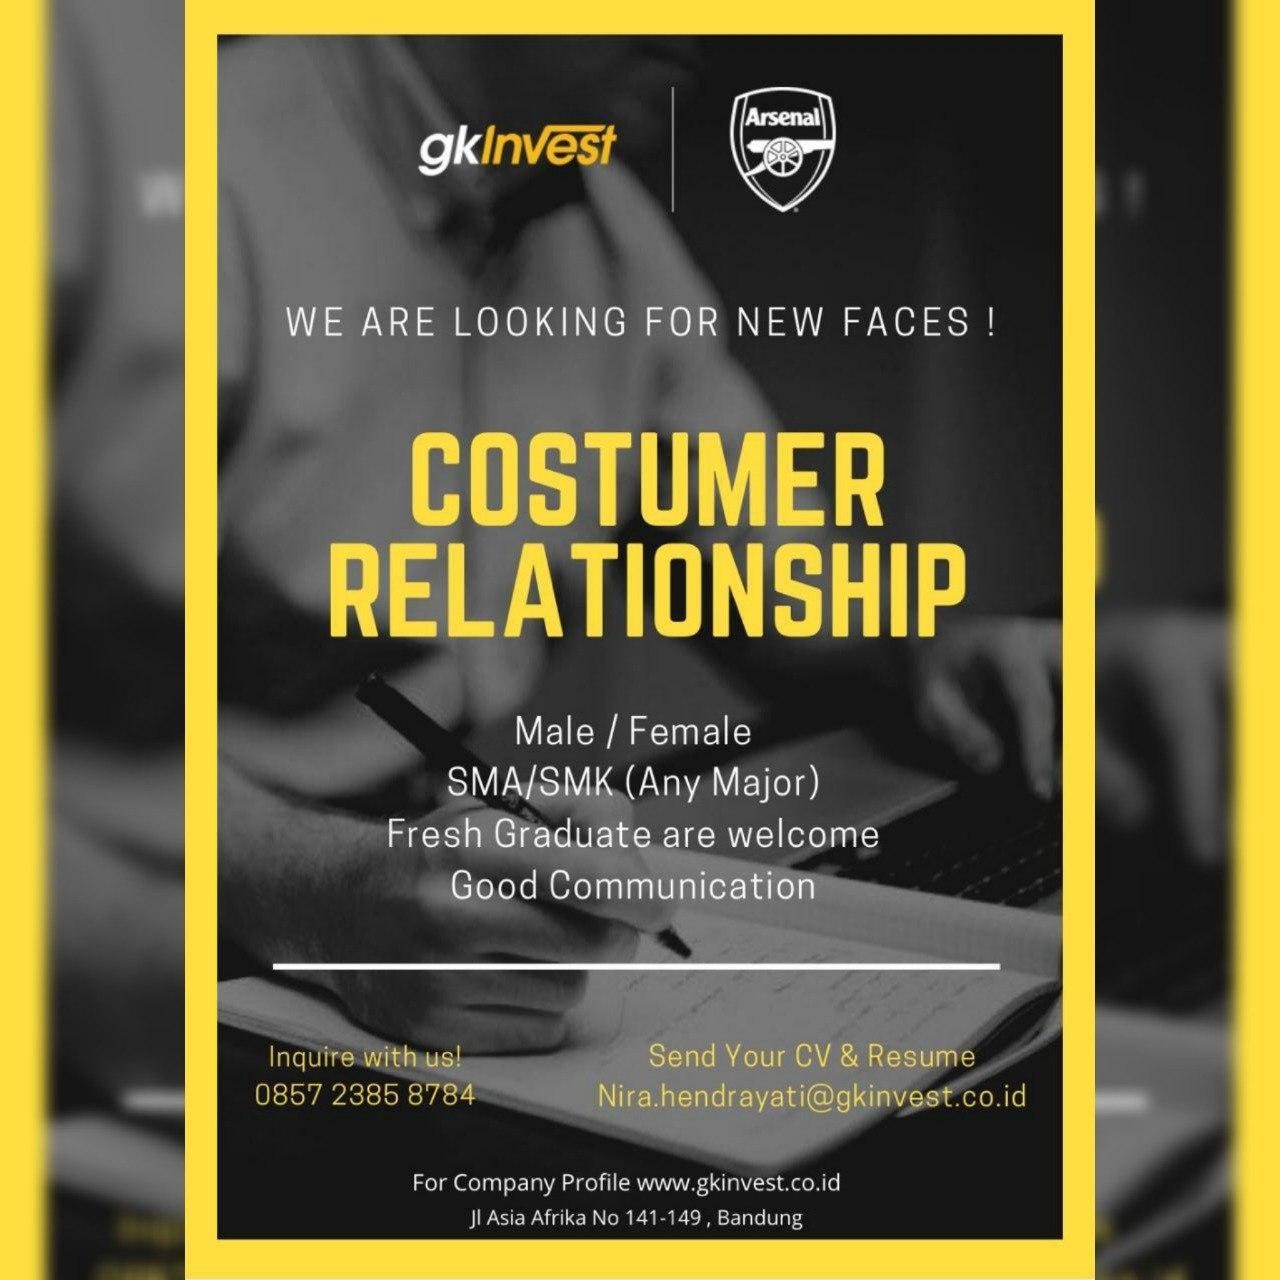 Lowongan Kerja Customer Relationship GkInvest Oktober 2020